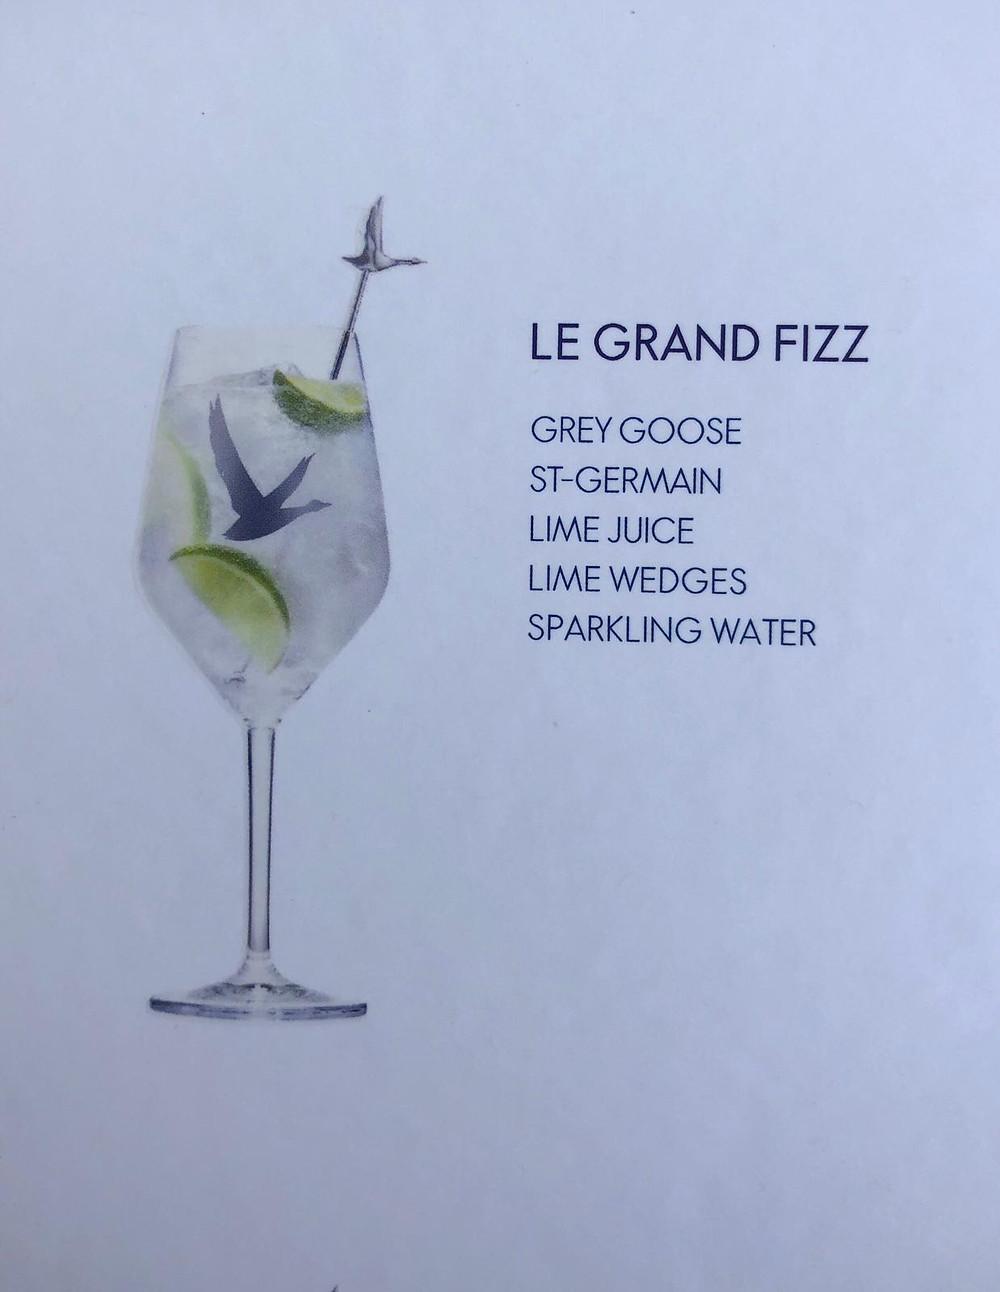 ÜberVida Mini Cruise Grey Goose LE GRAND FIZZ